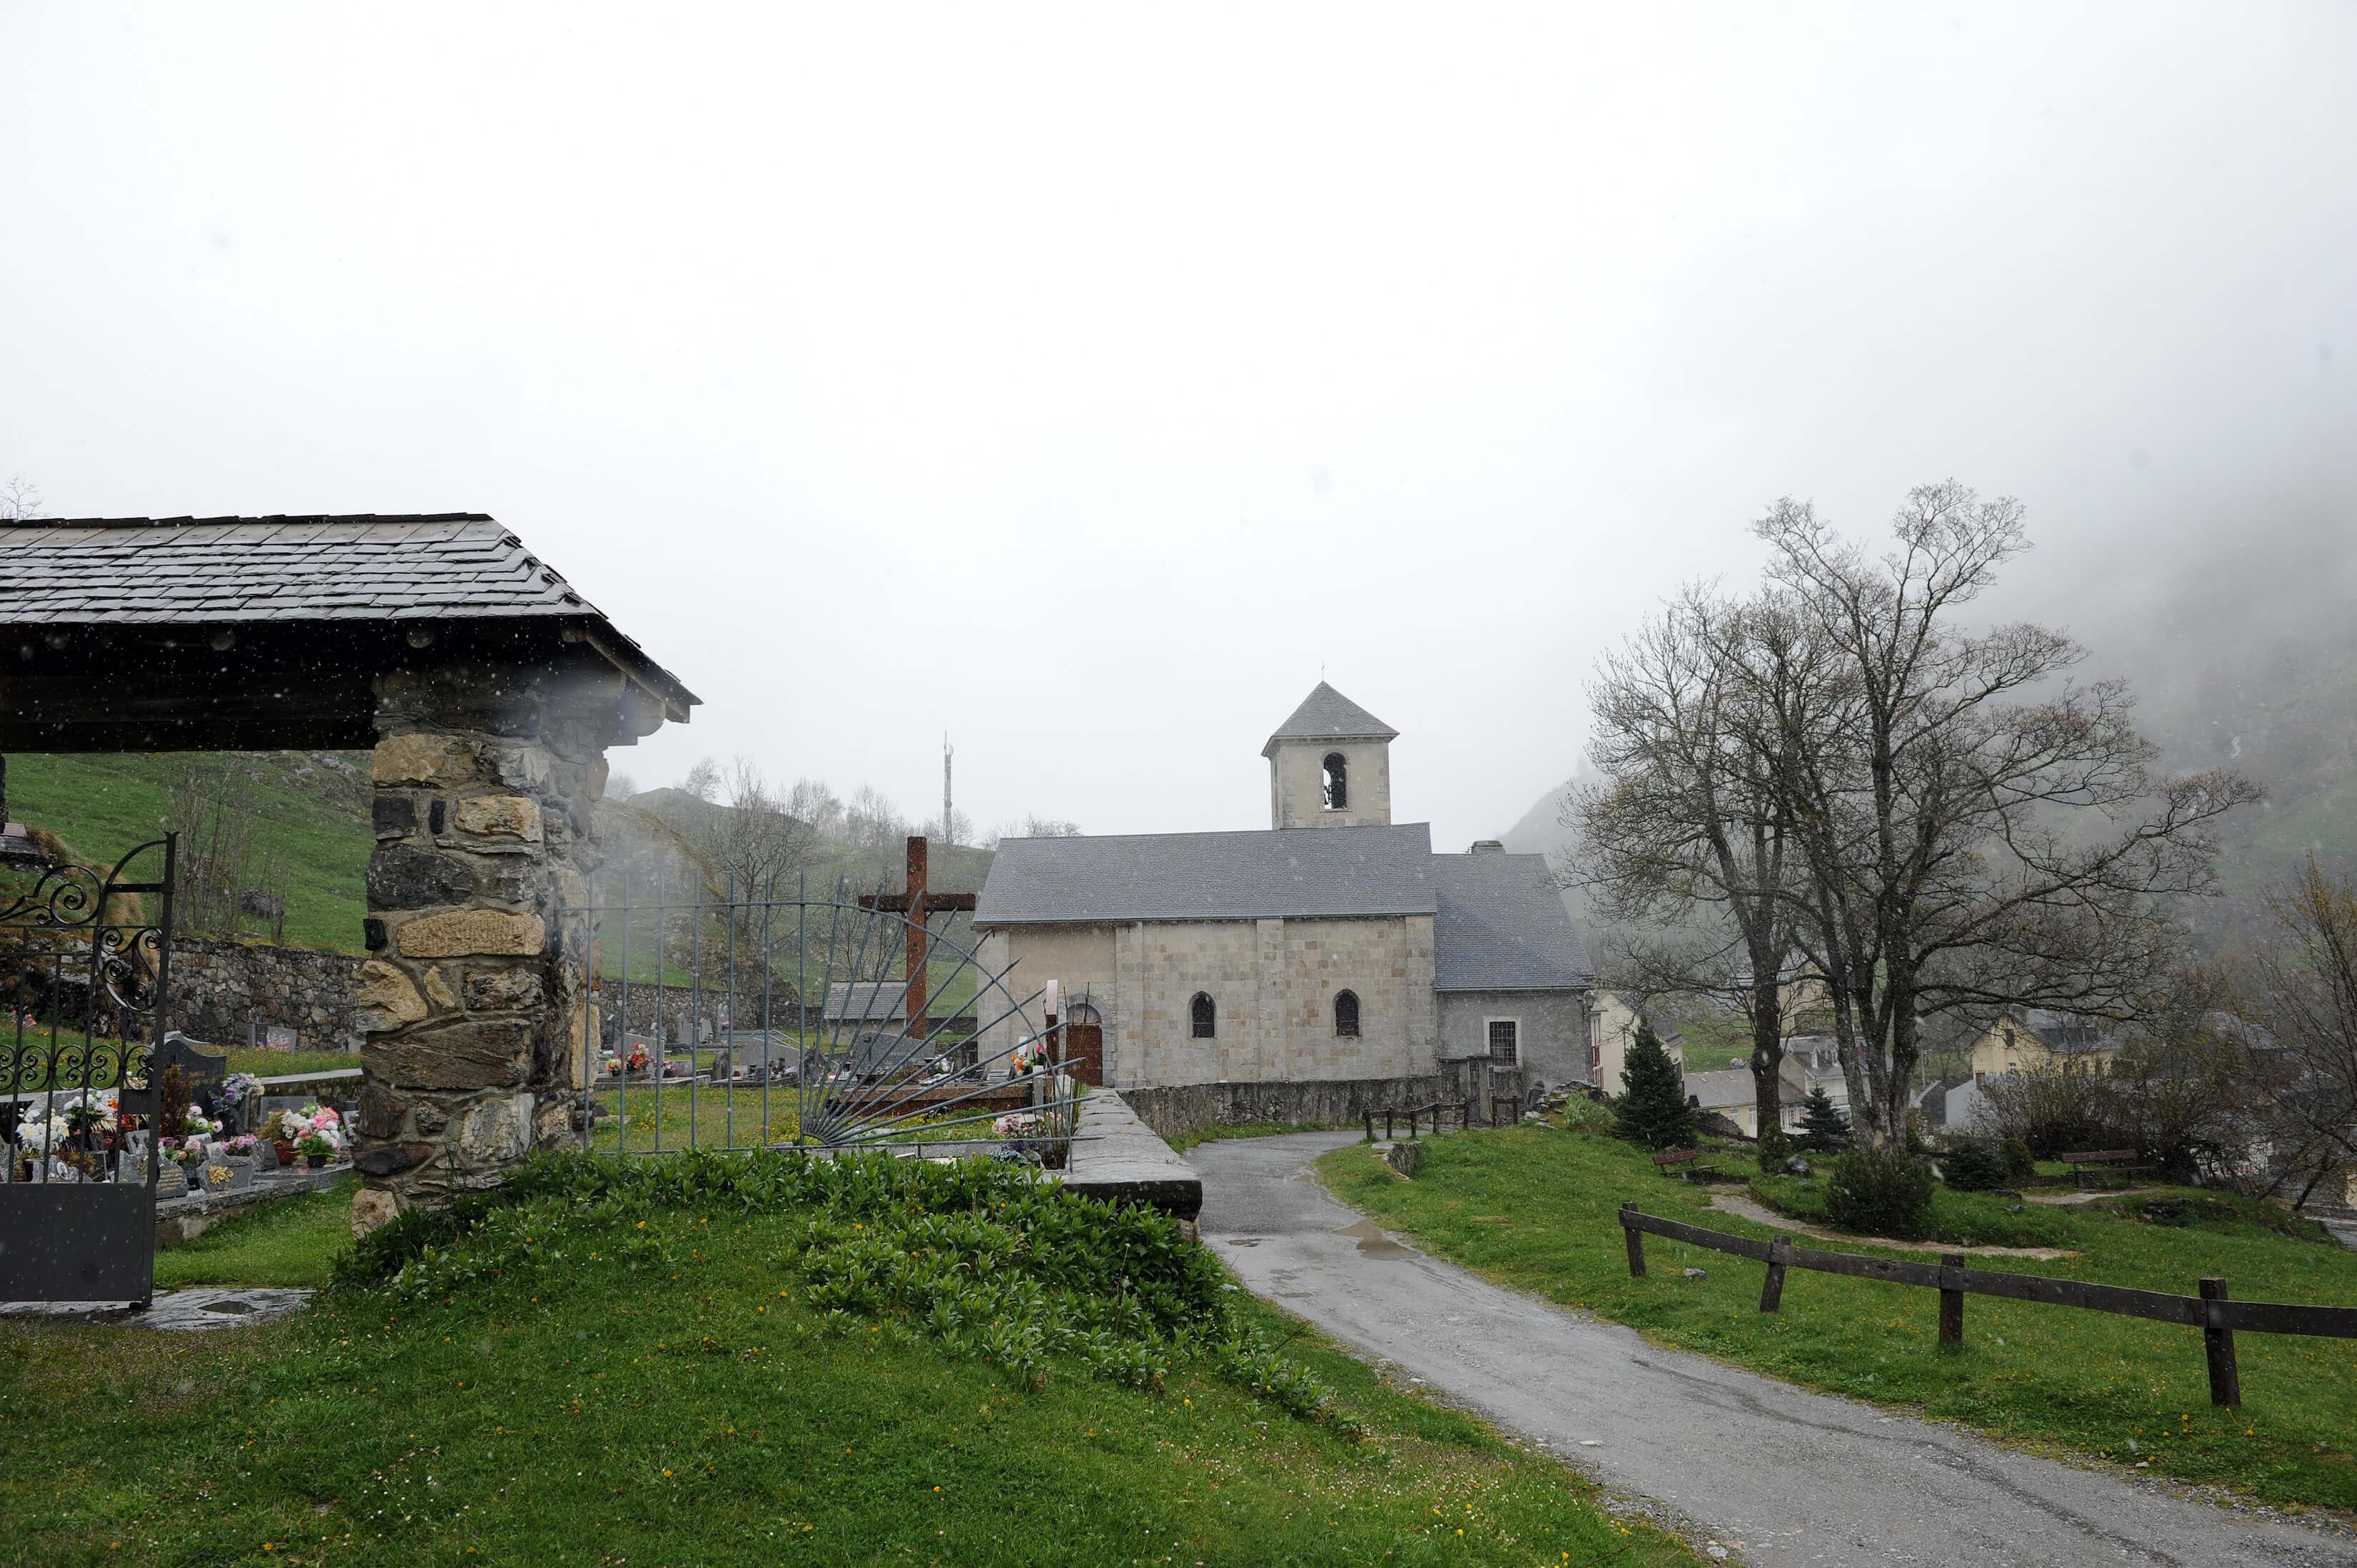 Eglise paroissiale Saint-Jean-Baptiste©ACIR / JJ Gelbart